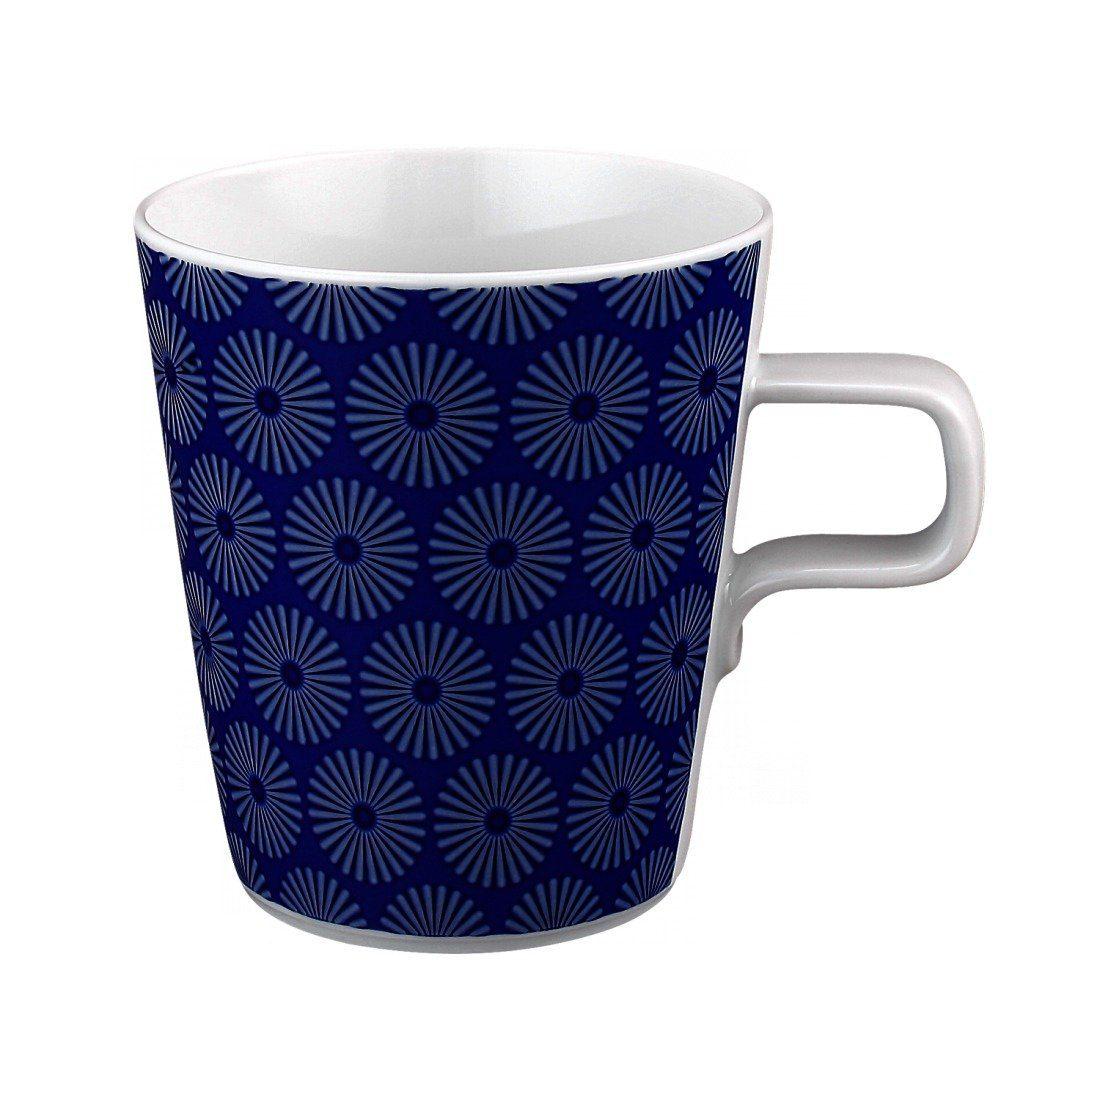 Seltmann Weiden Milchkaffeetasse »No Limits Blue-Motion«